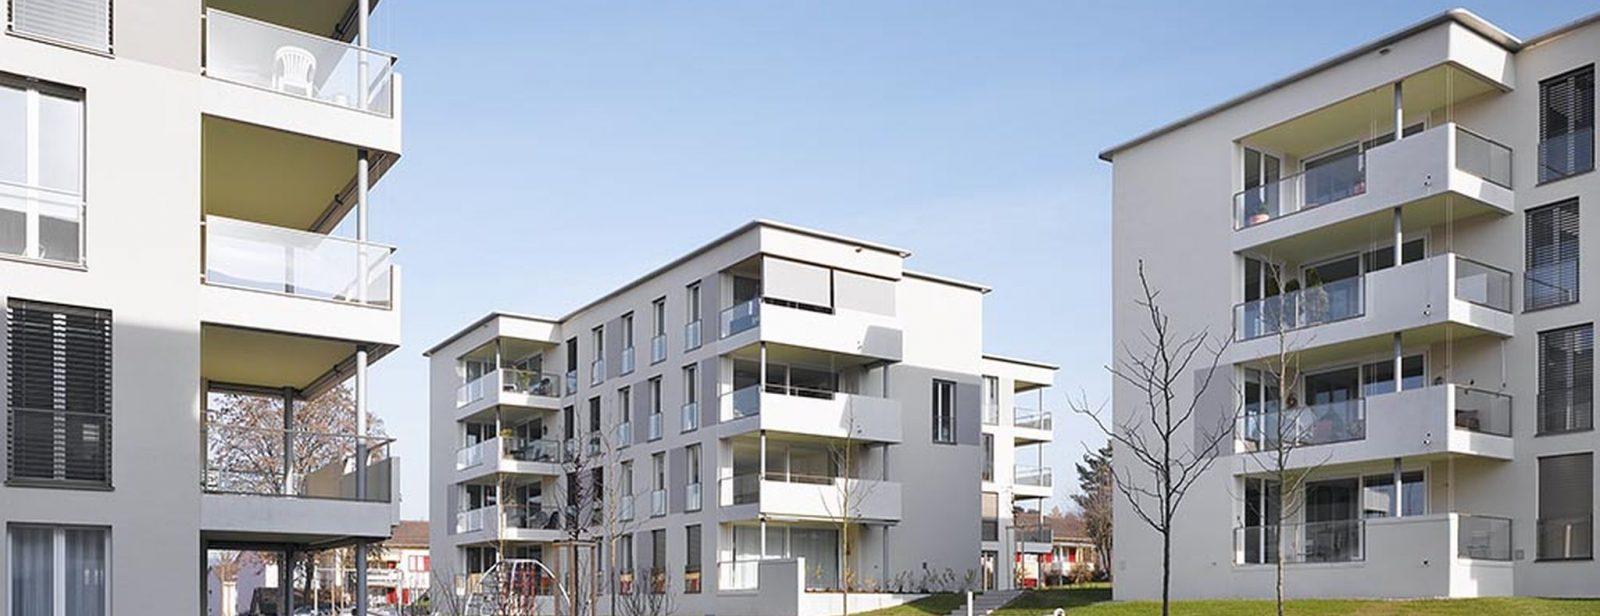 Siedlung Bramenring, Kloten, Etappe B